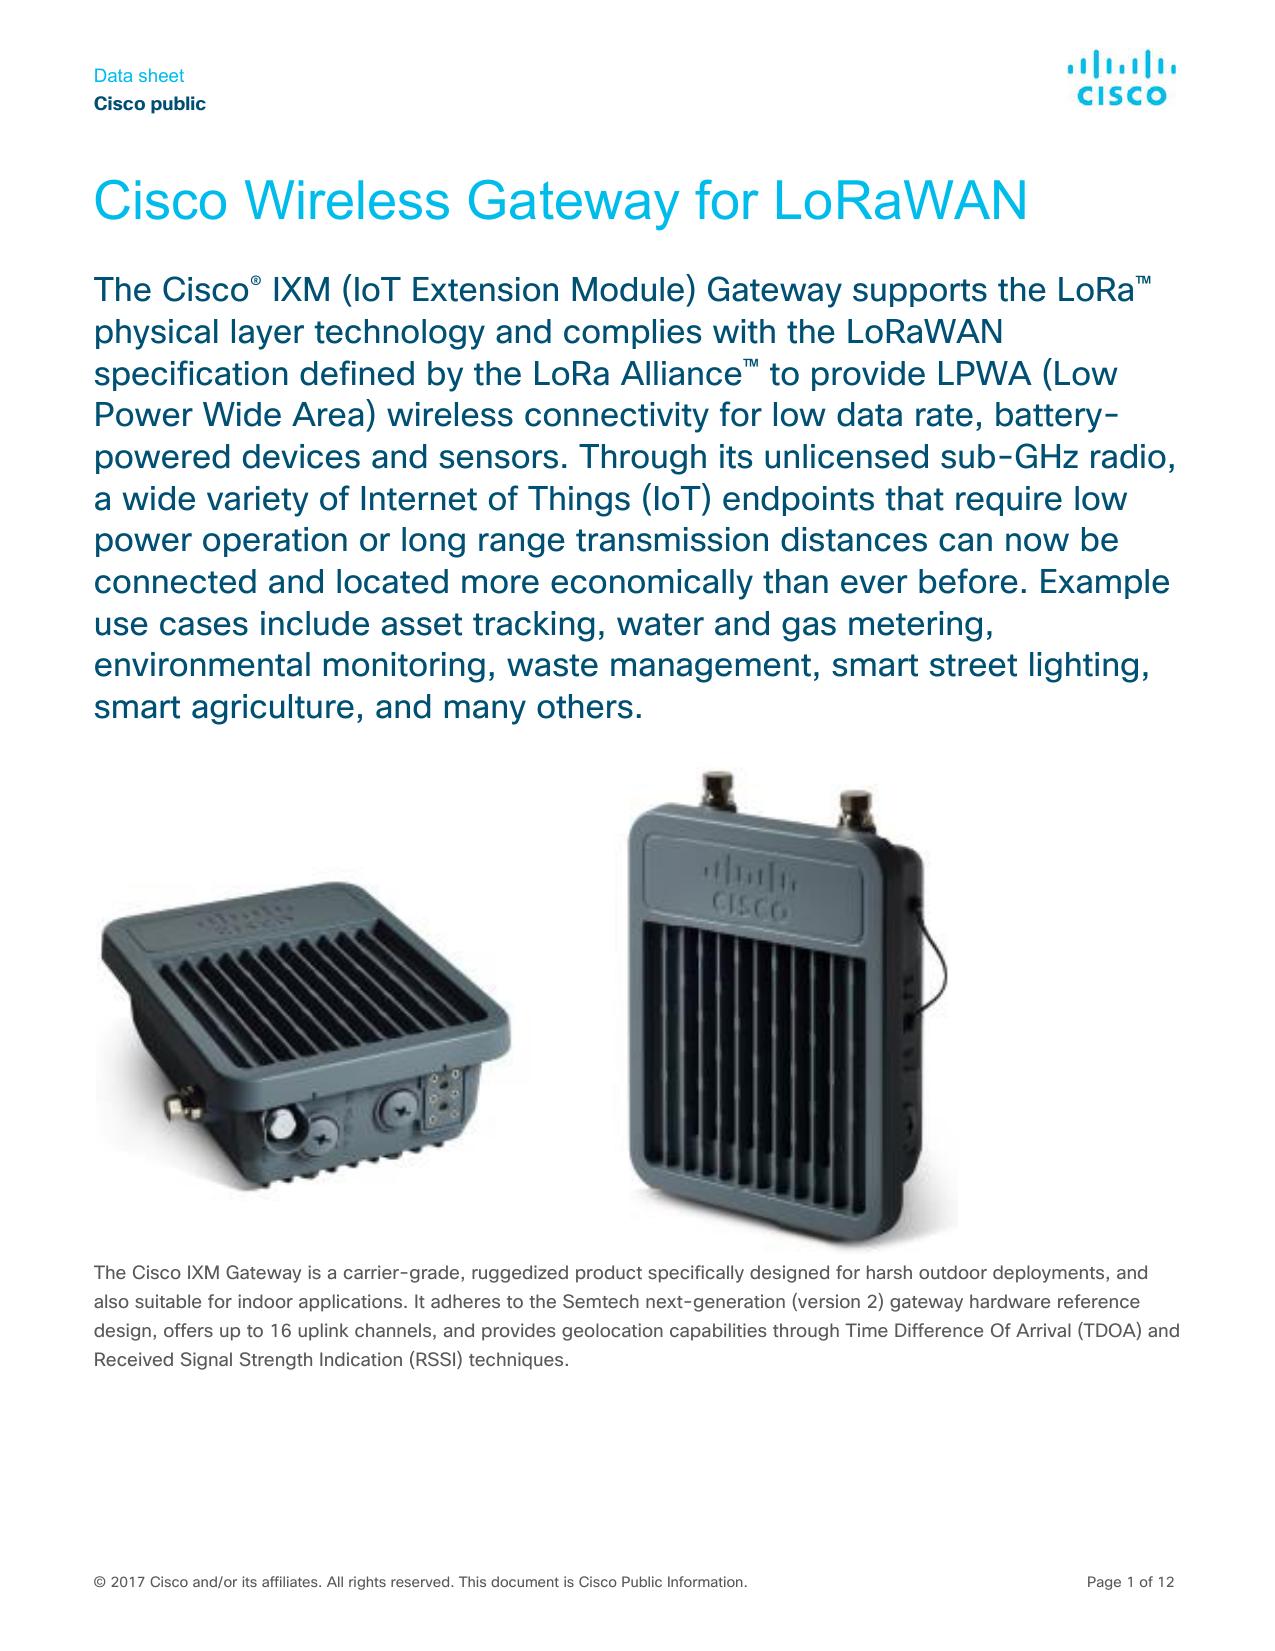 Cisco Wireless Gateway for LoRaWAN Data Sheet | manualzz com